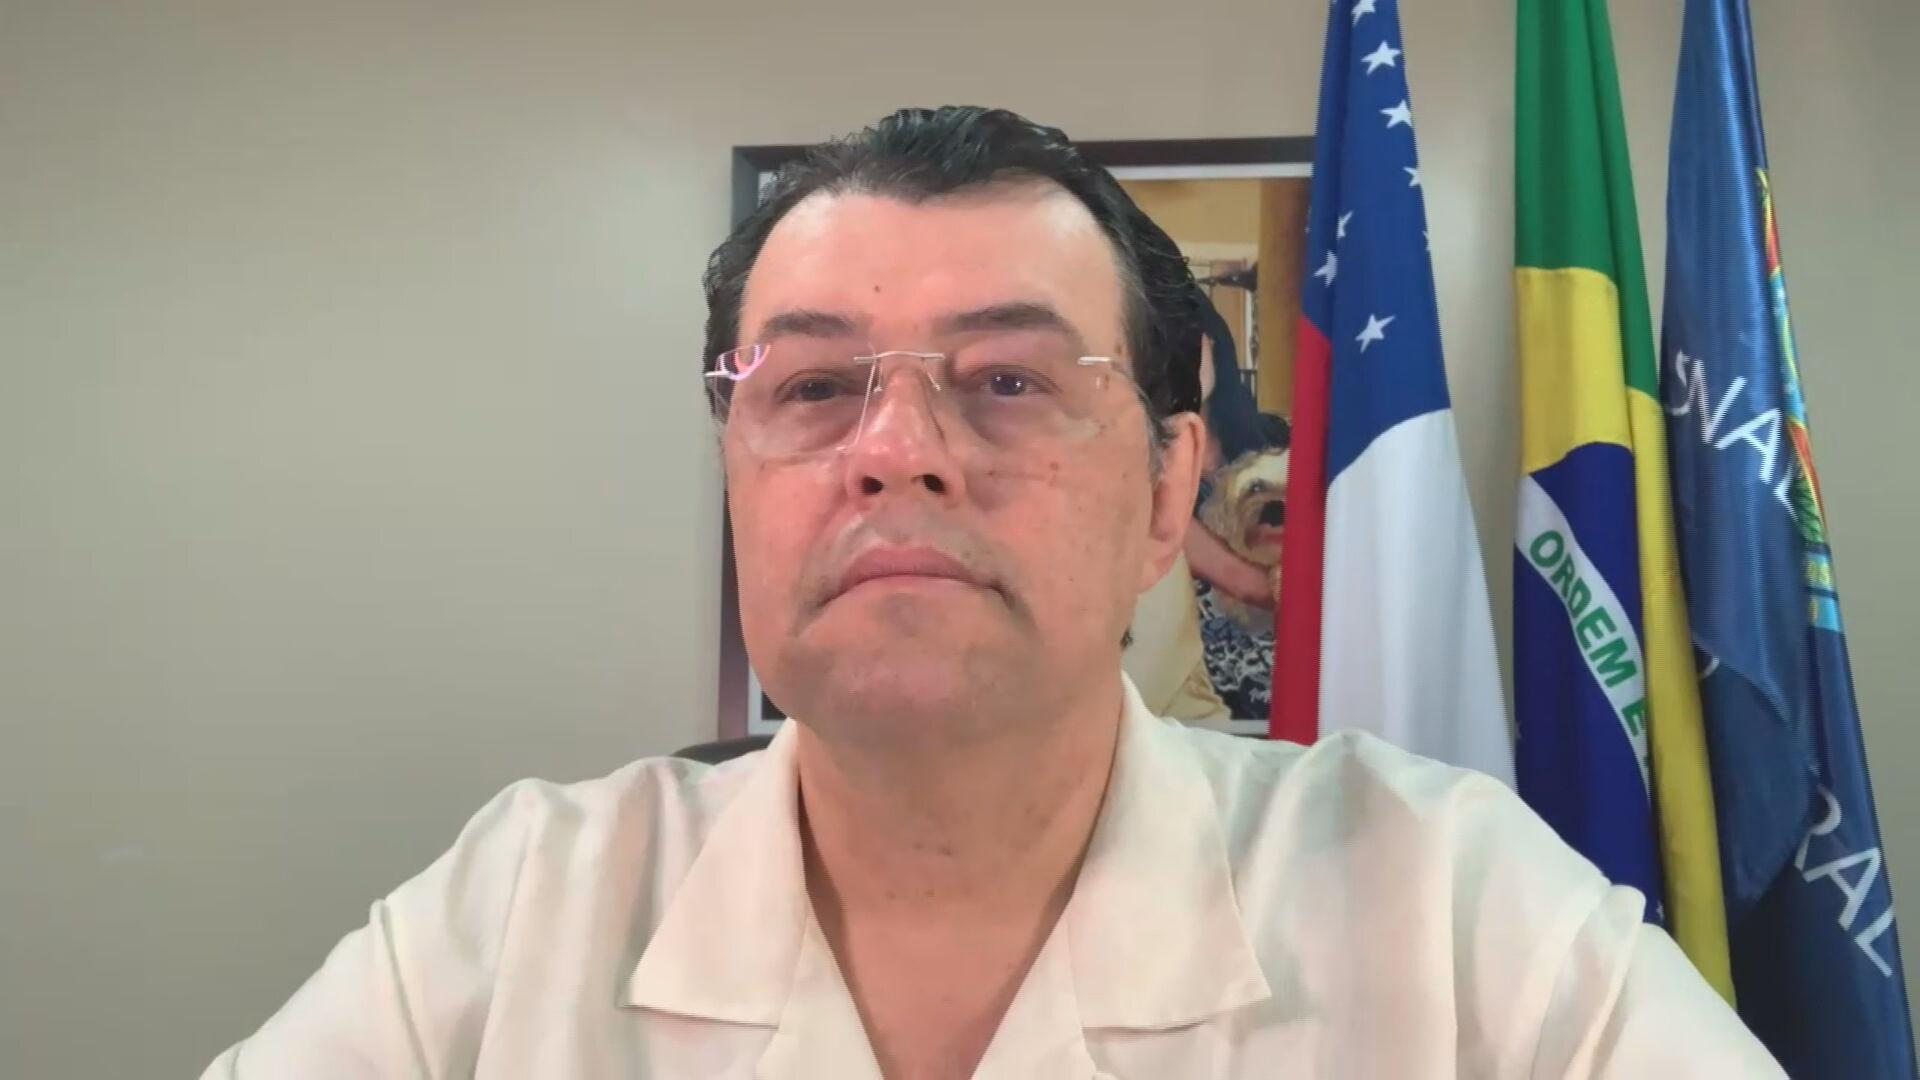 Senador Eduardo Braga (MDB-AM) integrante da CPI da Pandemia (29 de maio de 2021